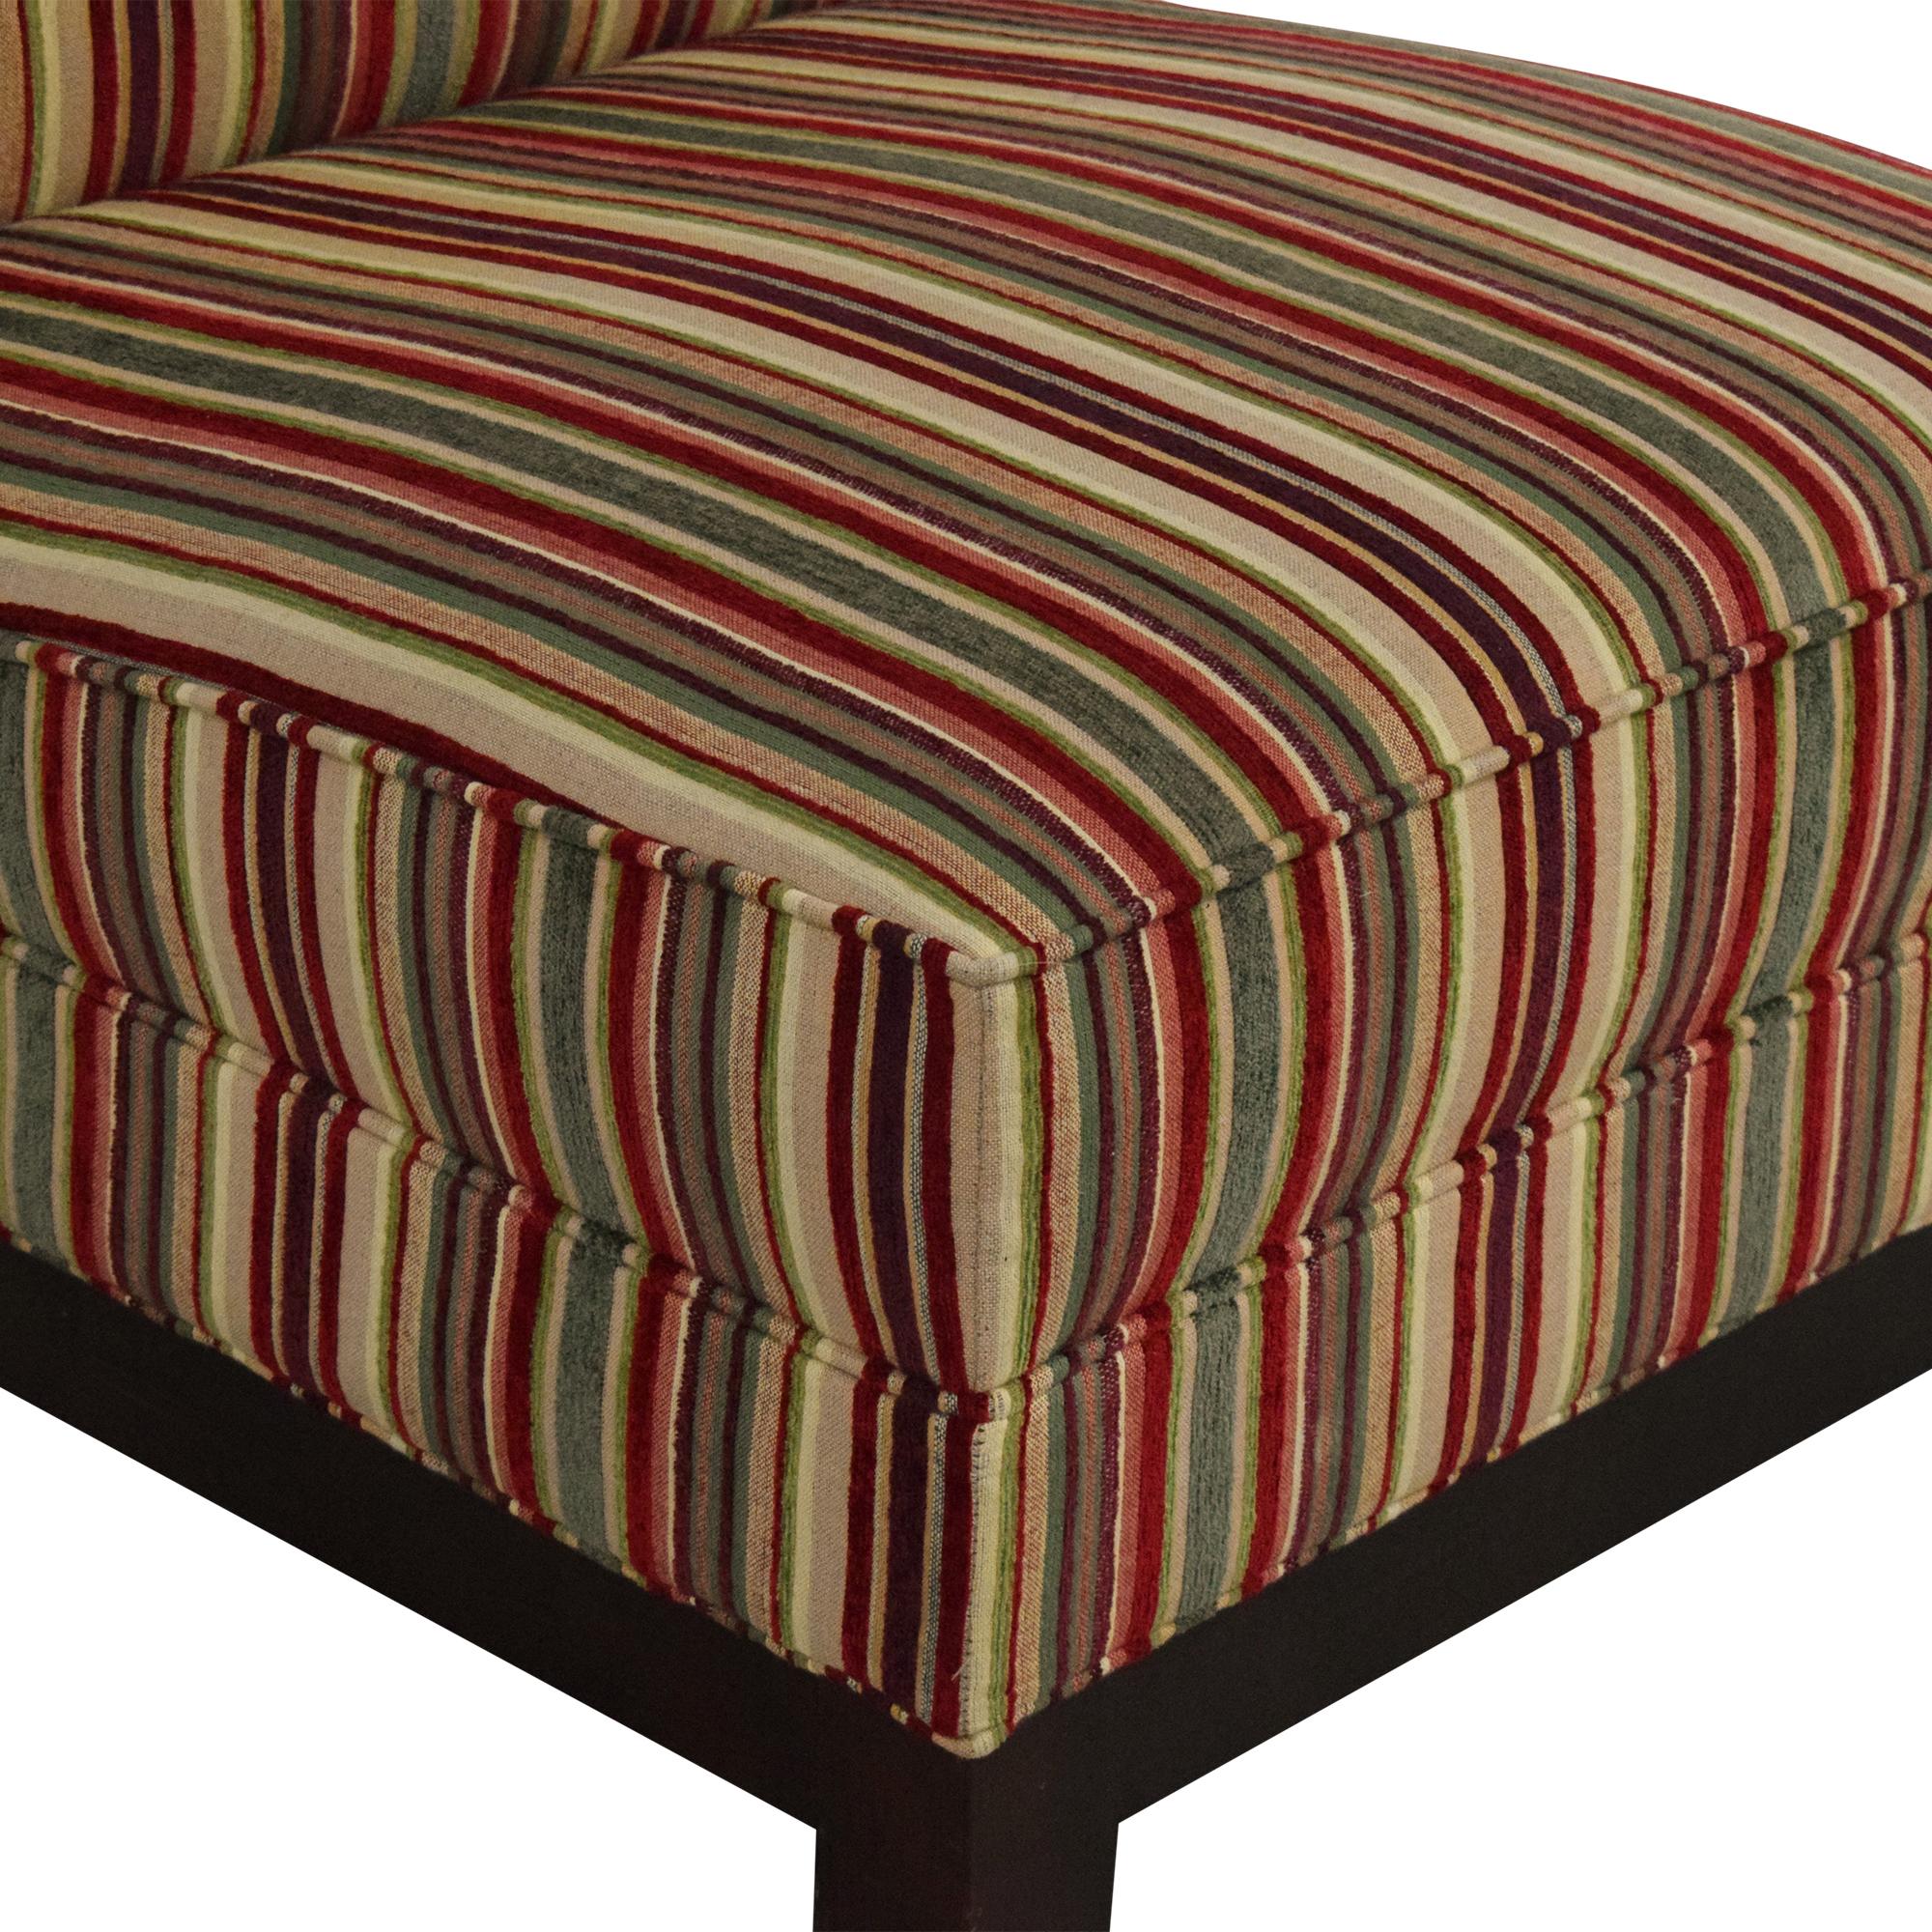 Mitchell Gold + Bob Williams Mitchell Gold + Bob Williams Slipper Chair multi